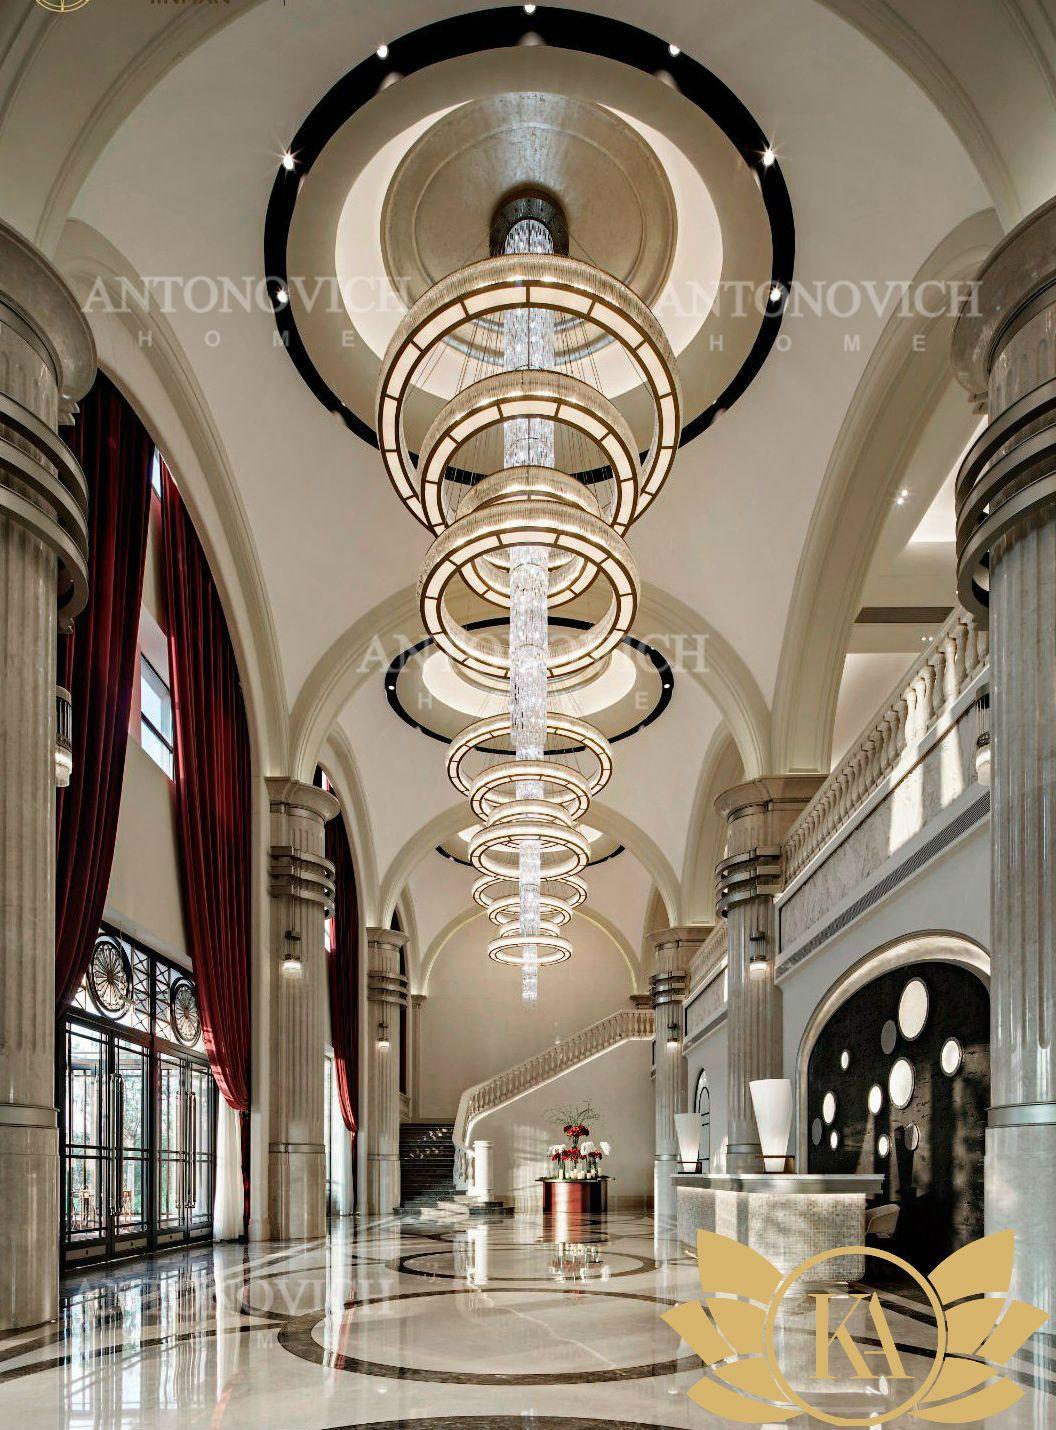 Artistic Chandelier Design Large Chandelier High Ceilings Crystal Chandelier Dining Room Chandelier In Living Room